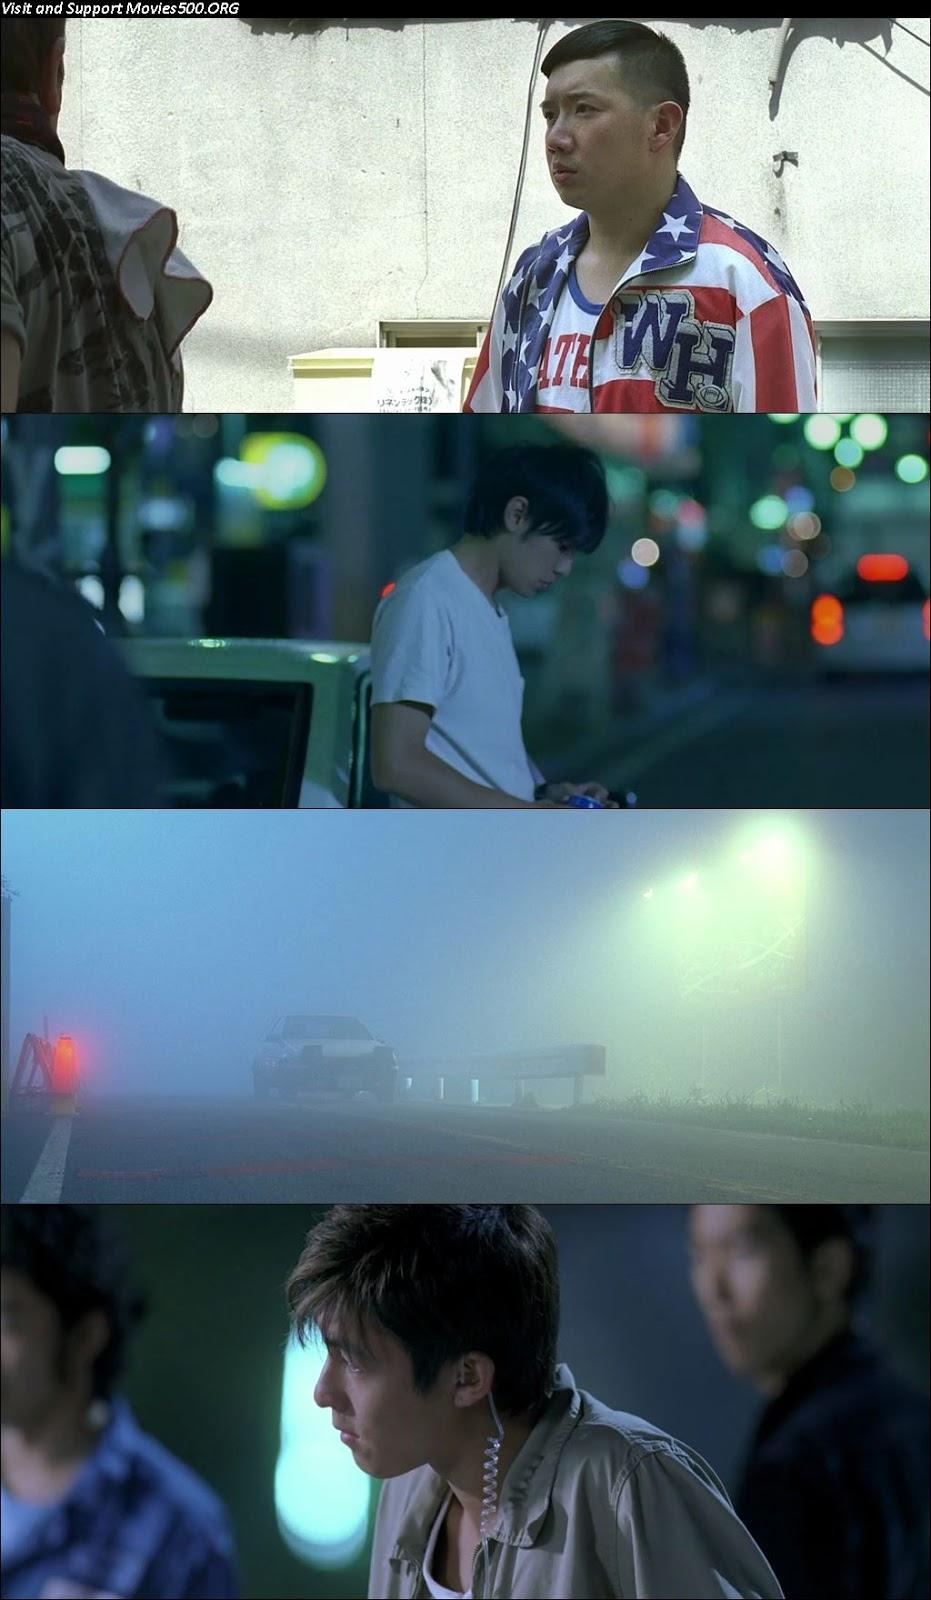 Initial D 2005 Dual Audio Hindi Download BluRay 720p ESubs at movies500.site